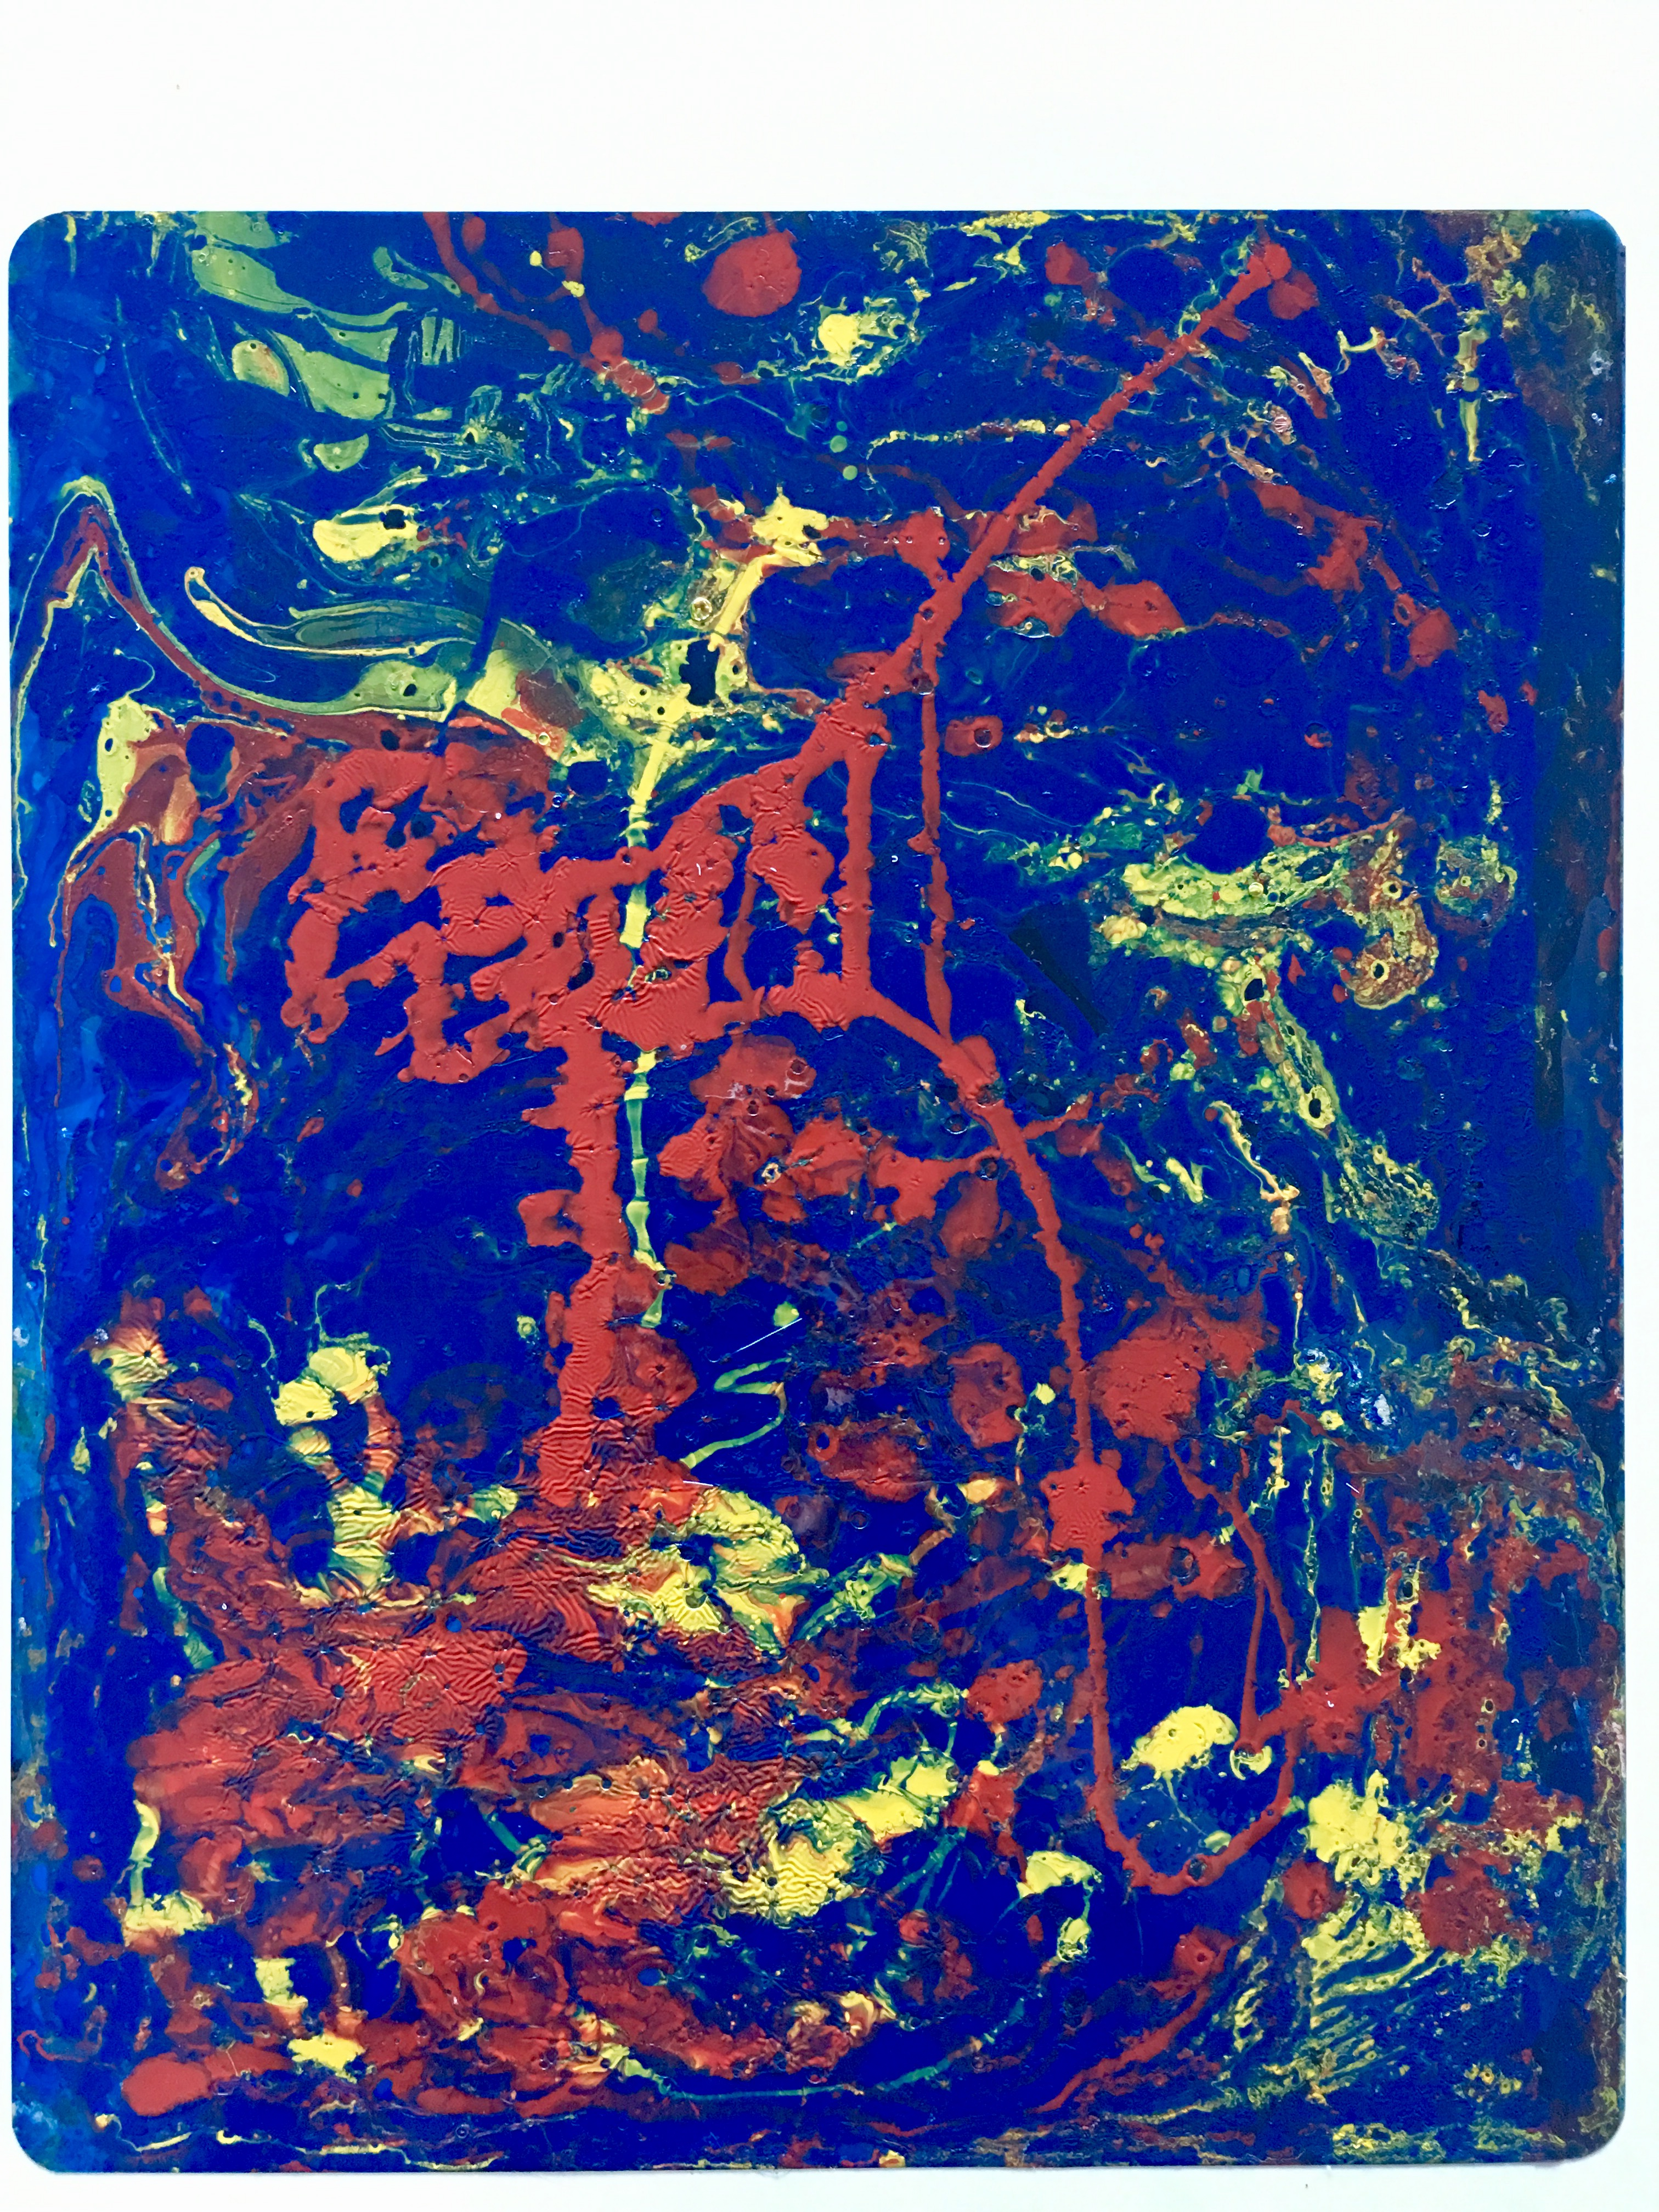 03 Abstrato Infinito 02